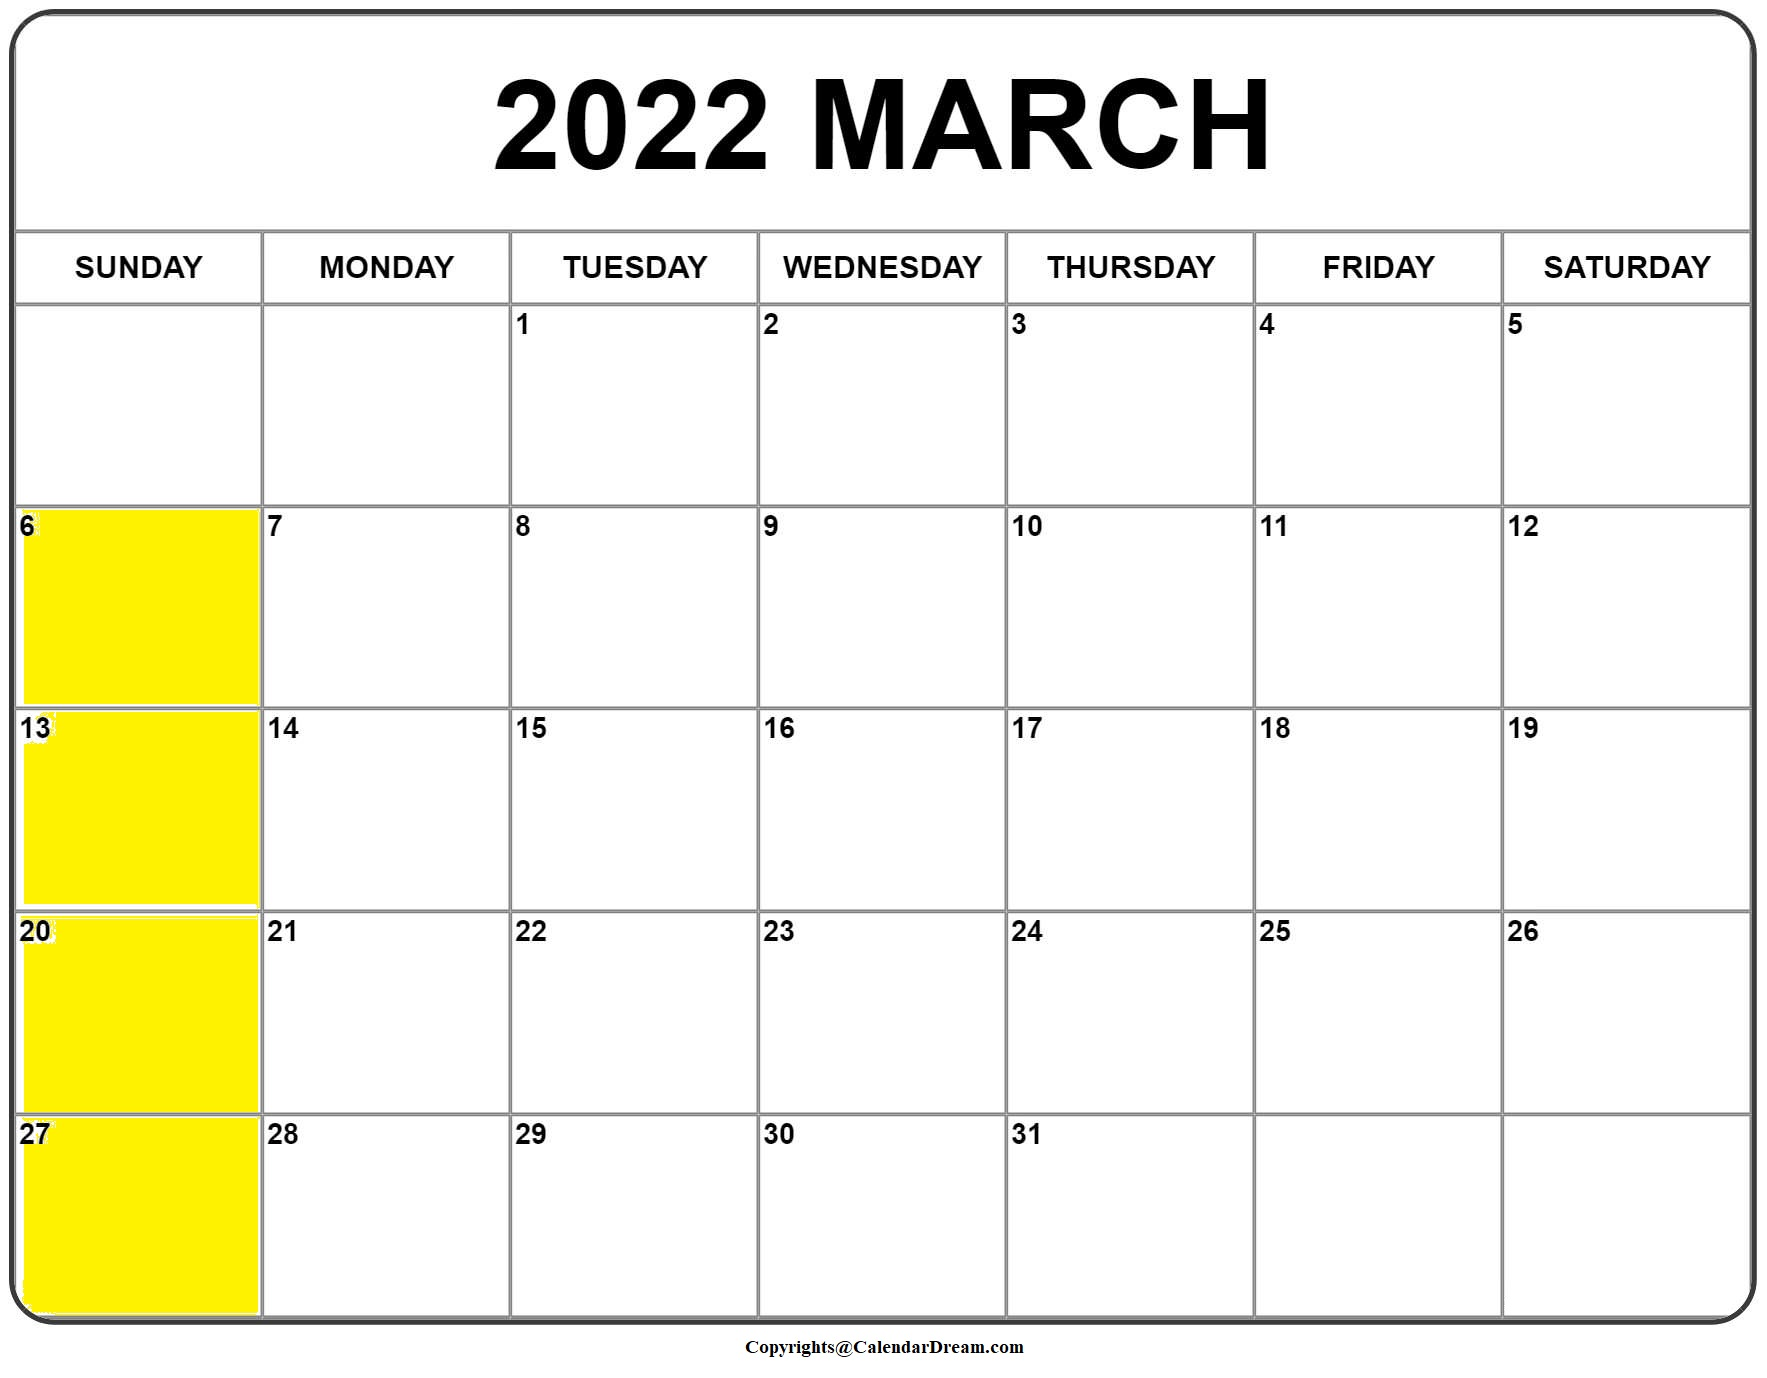 January February March 2022 Calendar.Printable March 2022 Calendar With Holidays In Pdf Word Calendar Dream